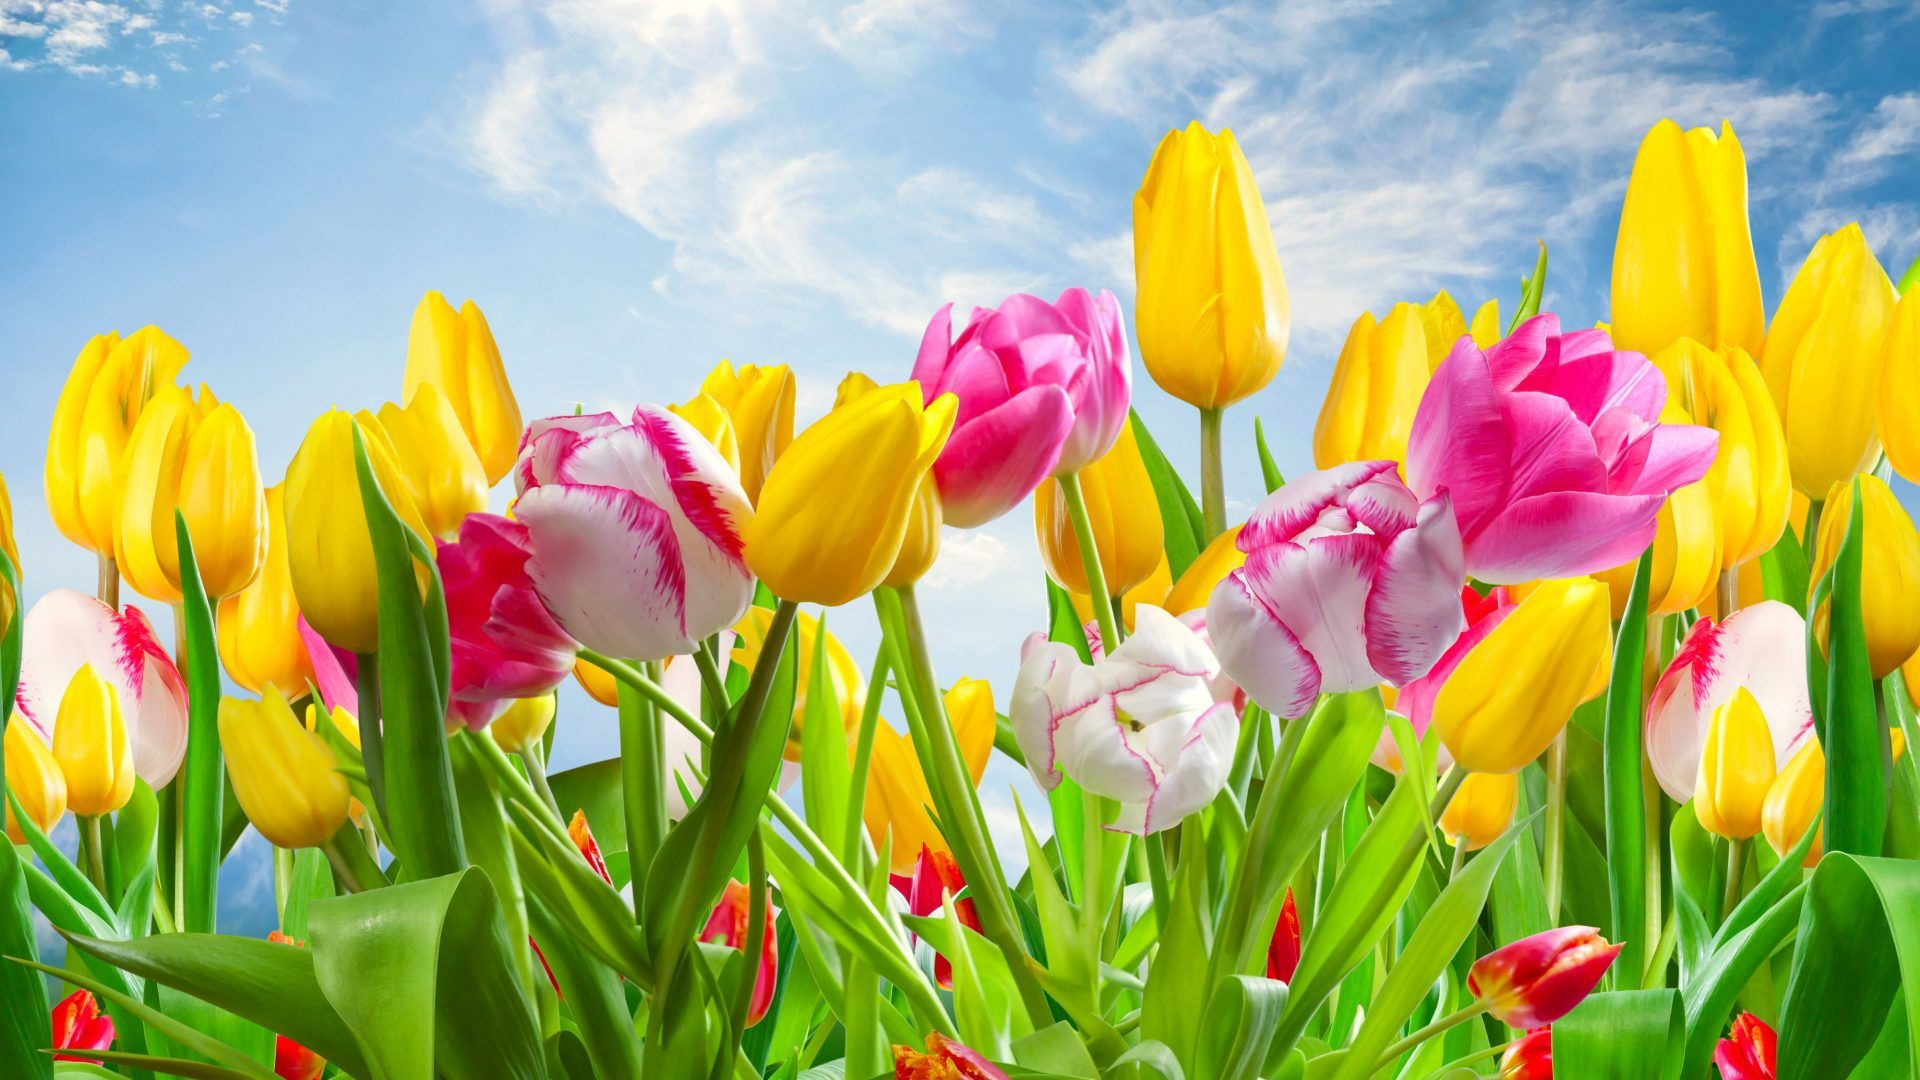 Flowers Tulips Sunshine Yellow Colors Spring Nature Pink Wallpaper Ios 8 Flower Flower Desktop Wallpaper Tulip Seeds Flowers Nature